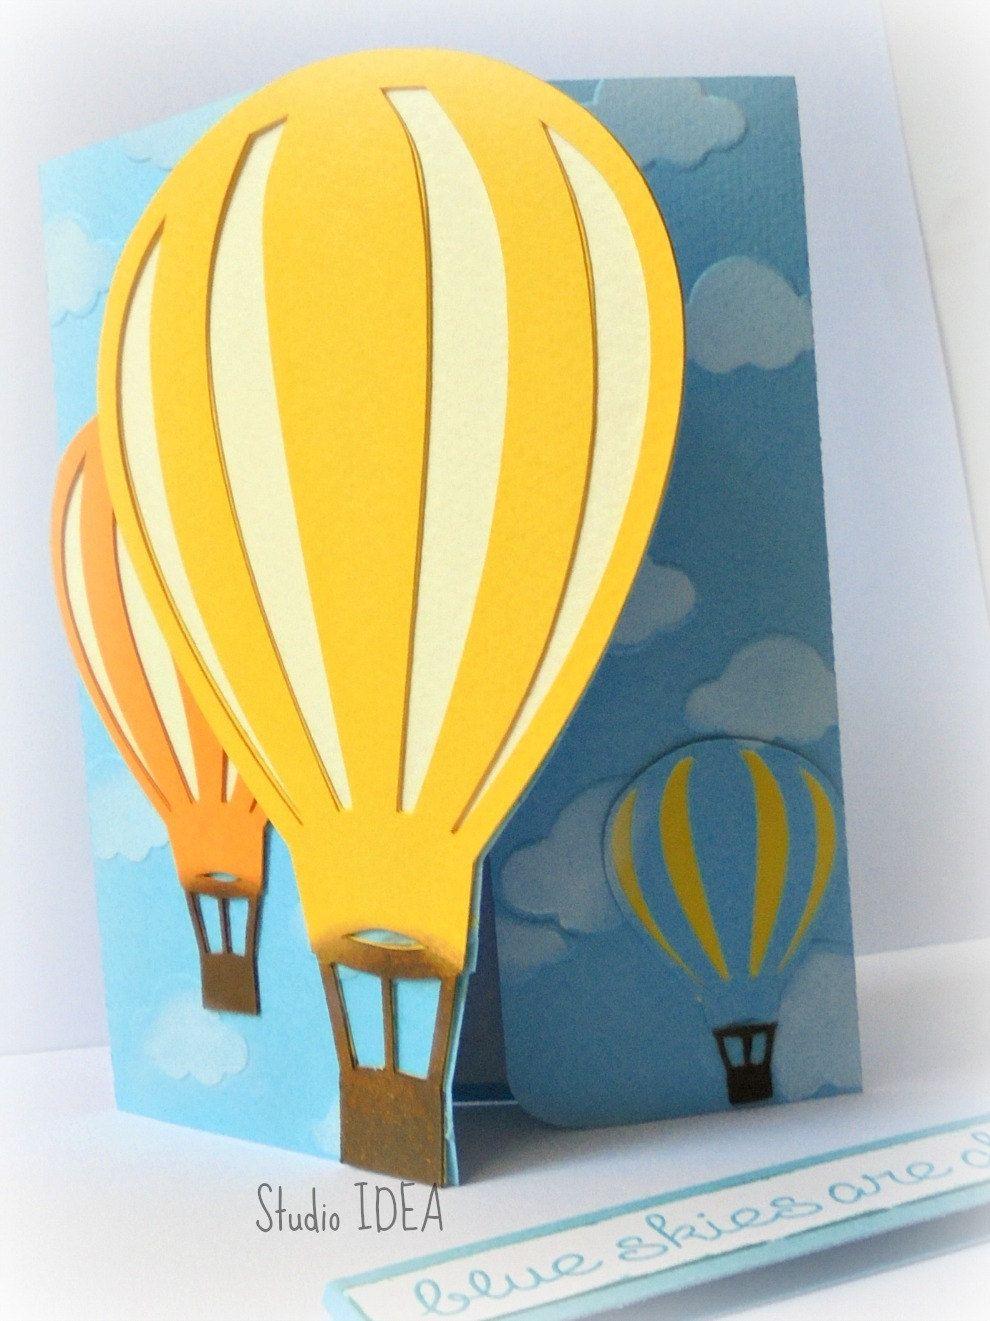 10 hotair balloon invitations handmade hot air balloon card 10 hotair balloon invitations handmade hot air balloon card invitation set of 10pcs bookmarktalkfo Image collections